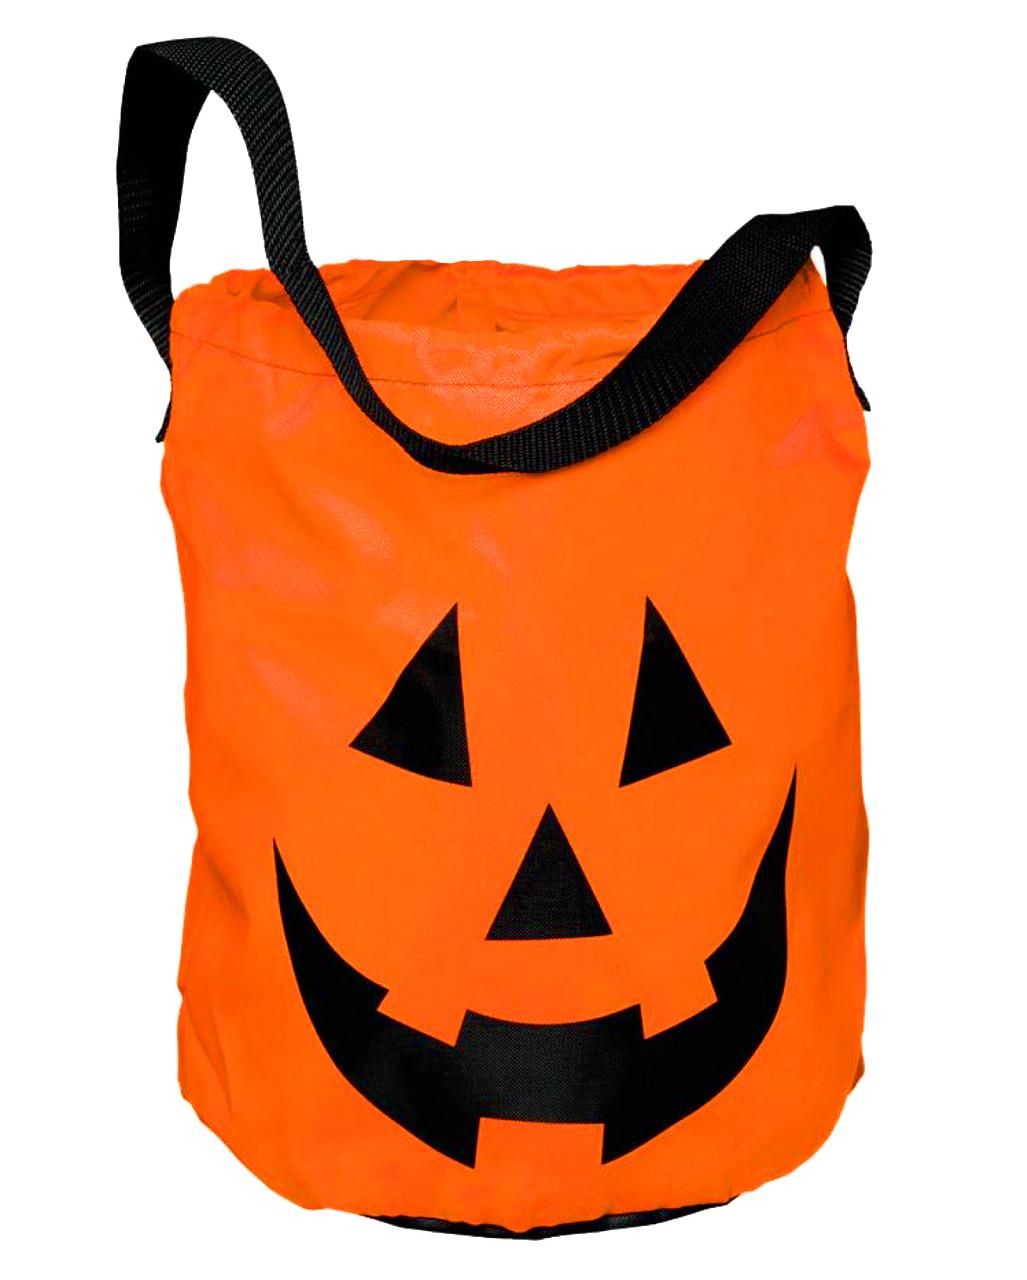 Pumpkin Bag  Trick Or Treat Bag Sack Halloween Bag Sweet Bag |  Horror Shop.com